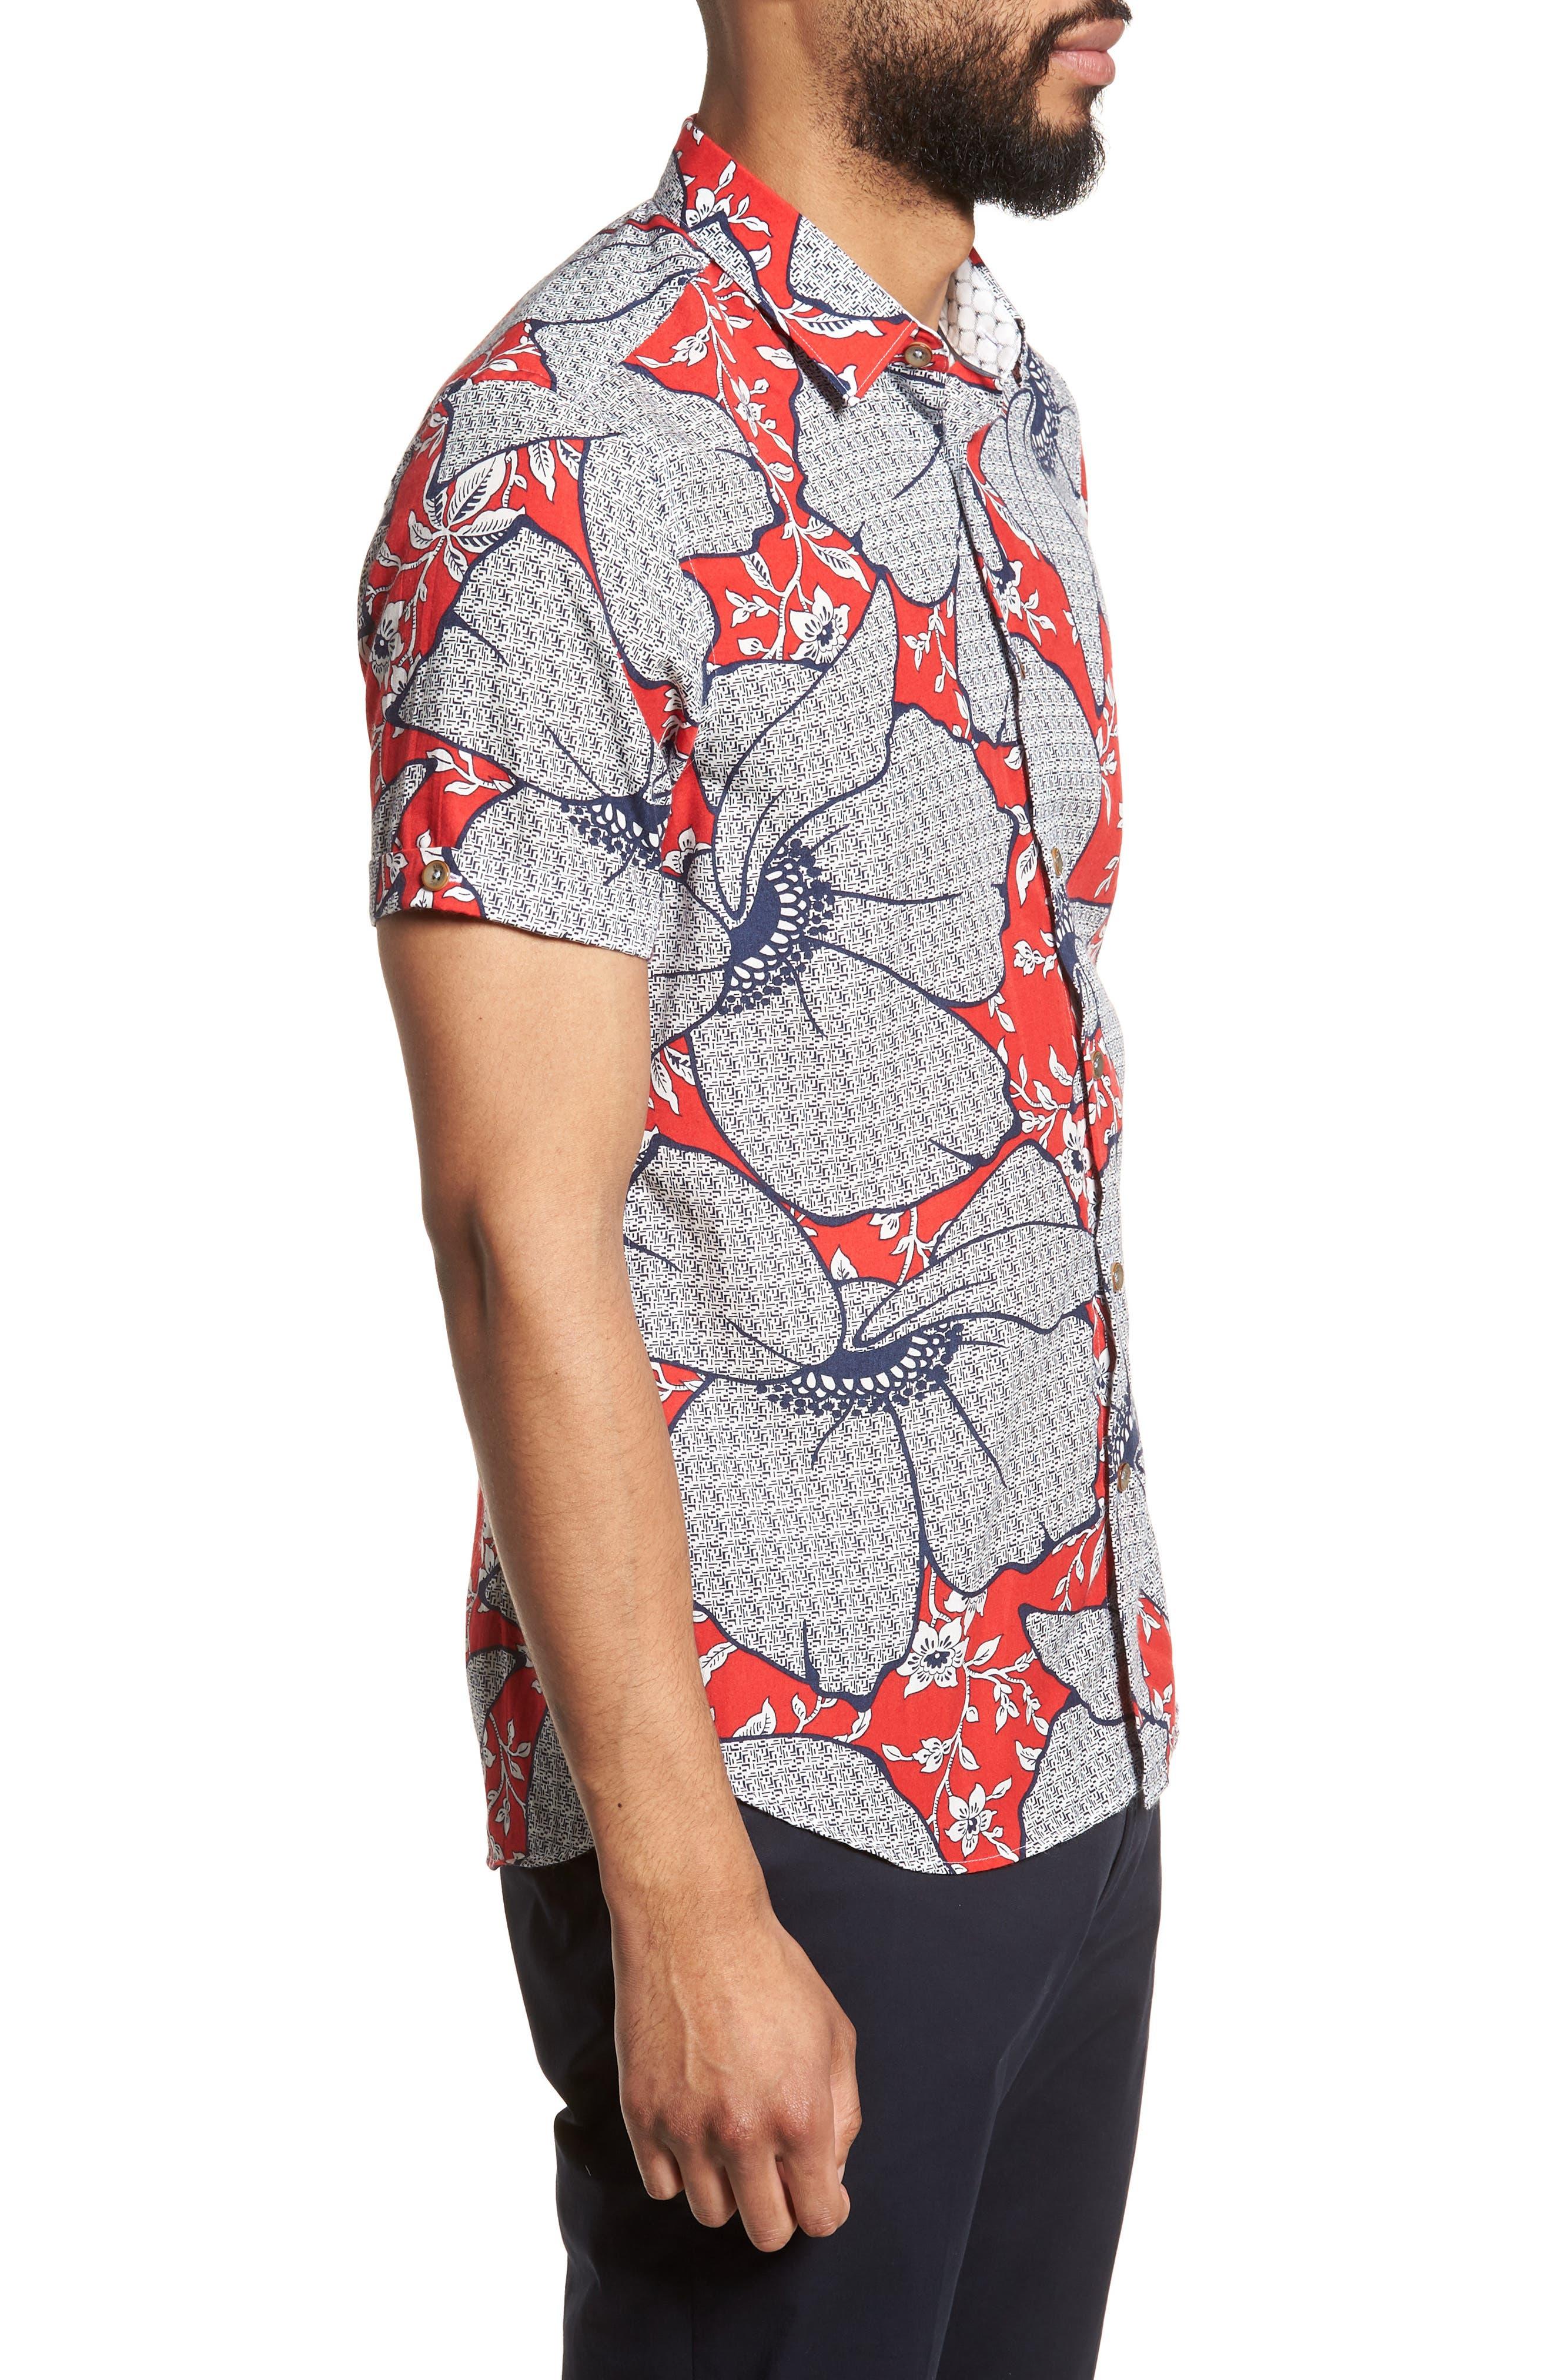 Sohot Trim Fit Floral Sport Shirt,                             Alternate thumbnail 3, color,                             RED